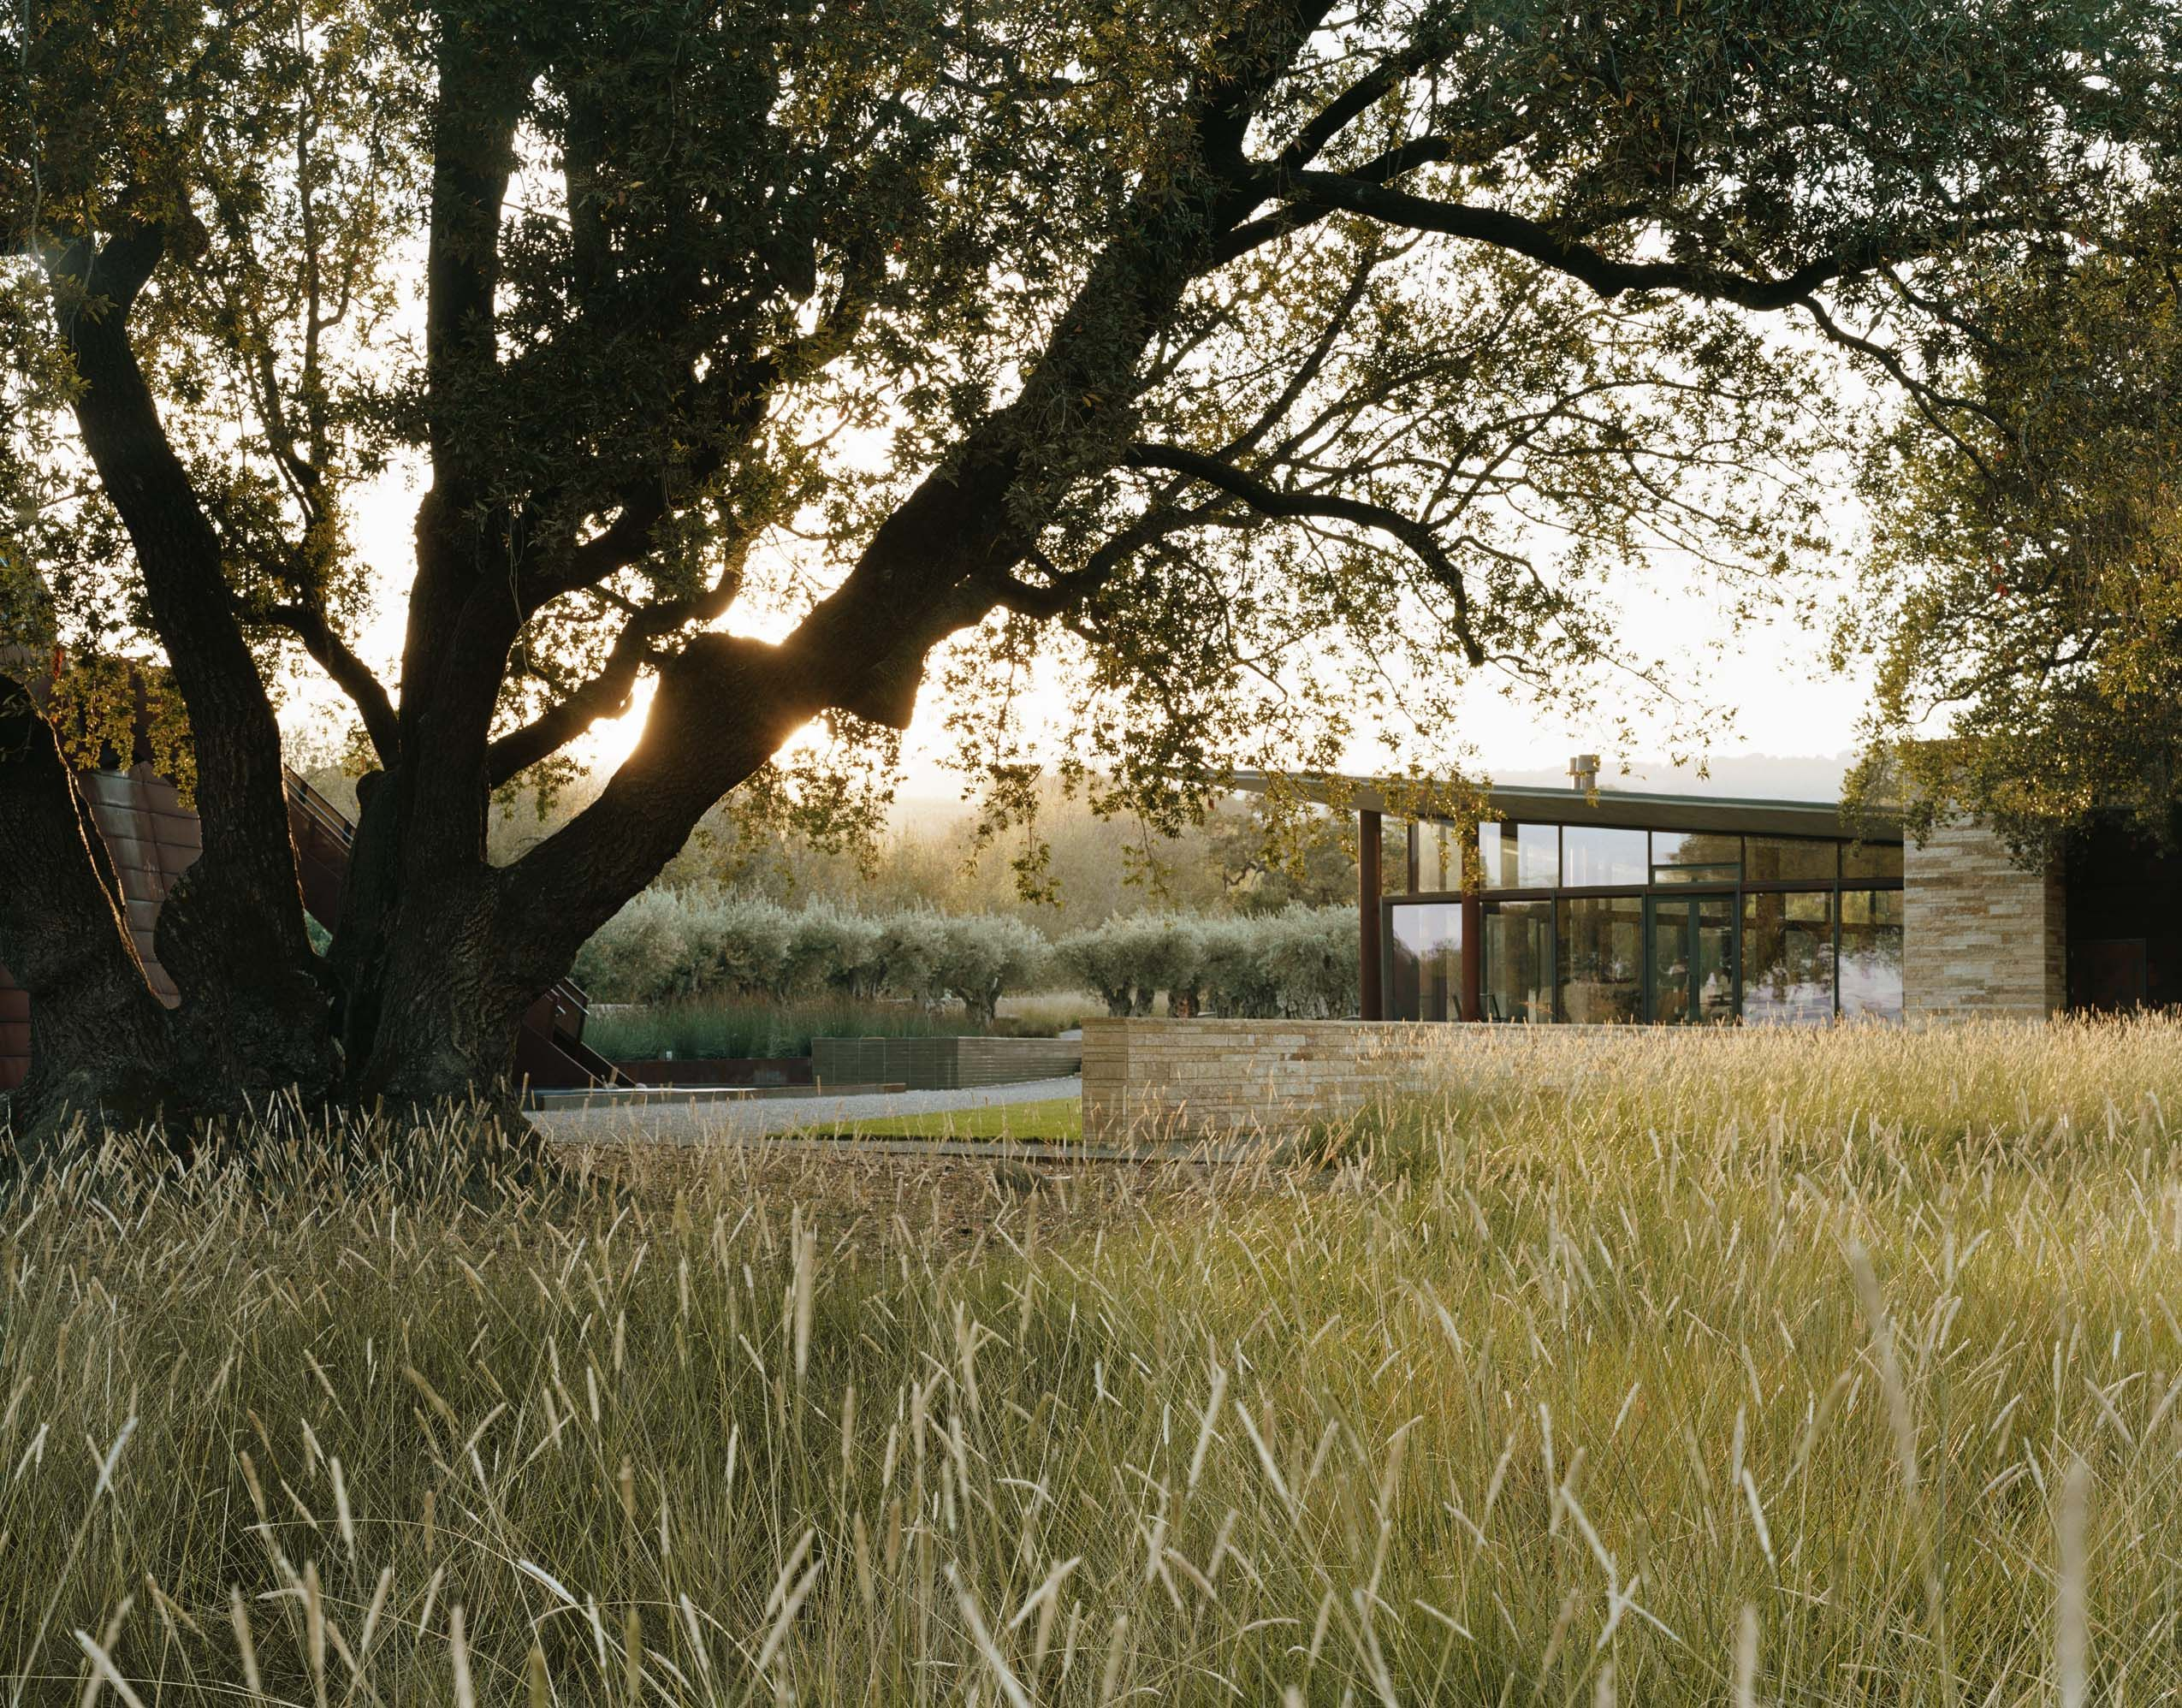 Mediterranean feel at Stone Edge farm in Sonoma, California ...